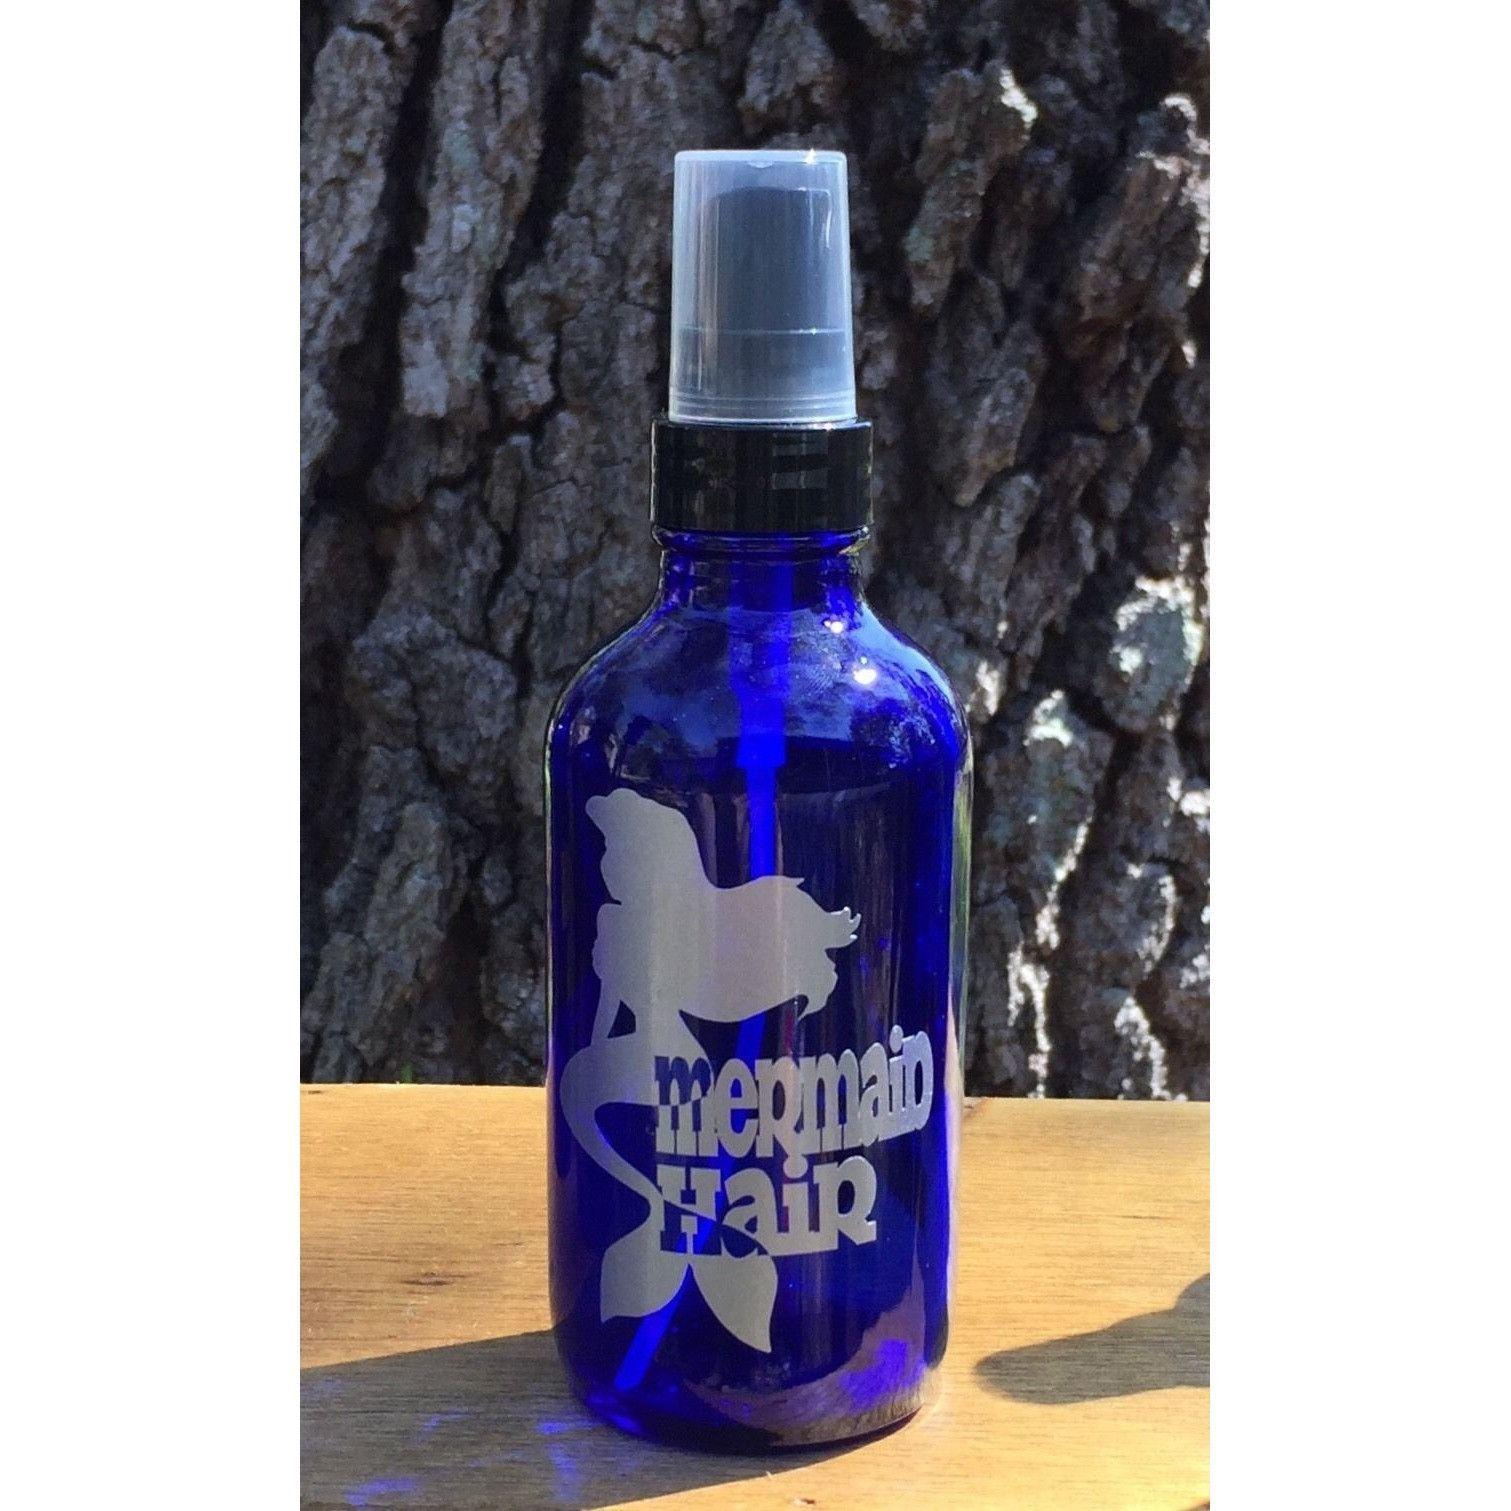 Oz Glass Spray Bottle W Metallic Silver Mermaid Hair Precision - Vinyl stickers for glass bottles